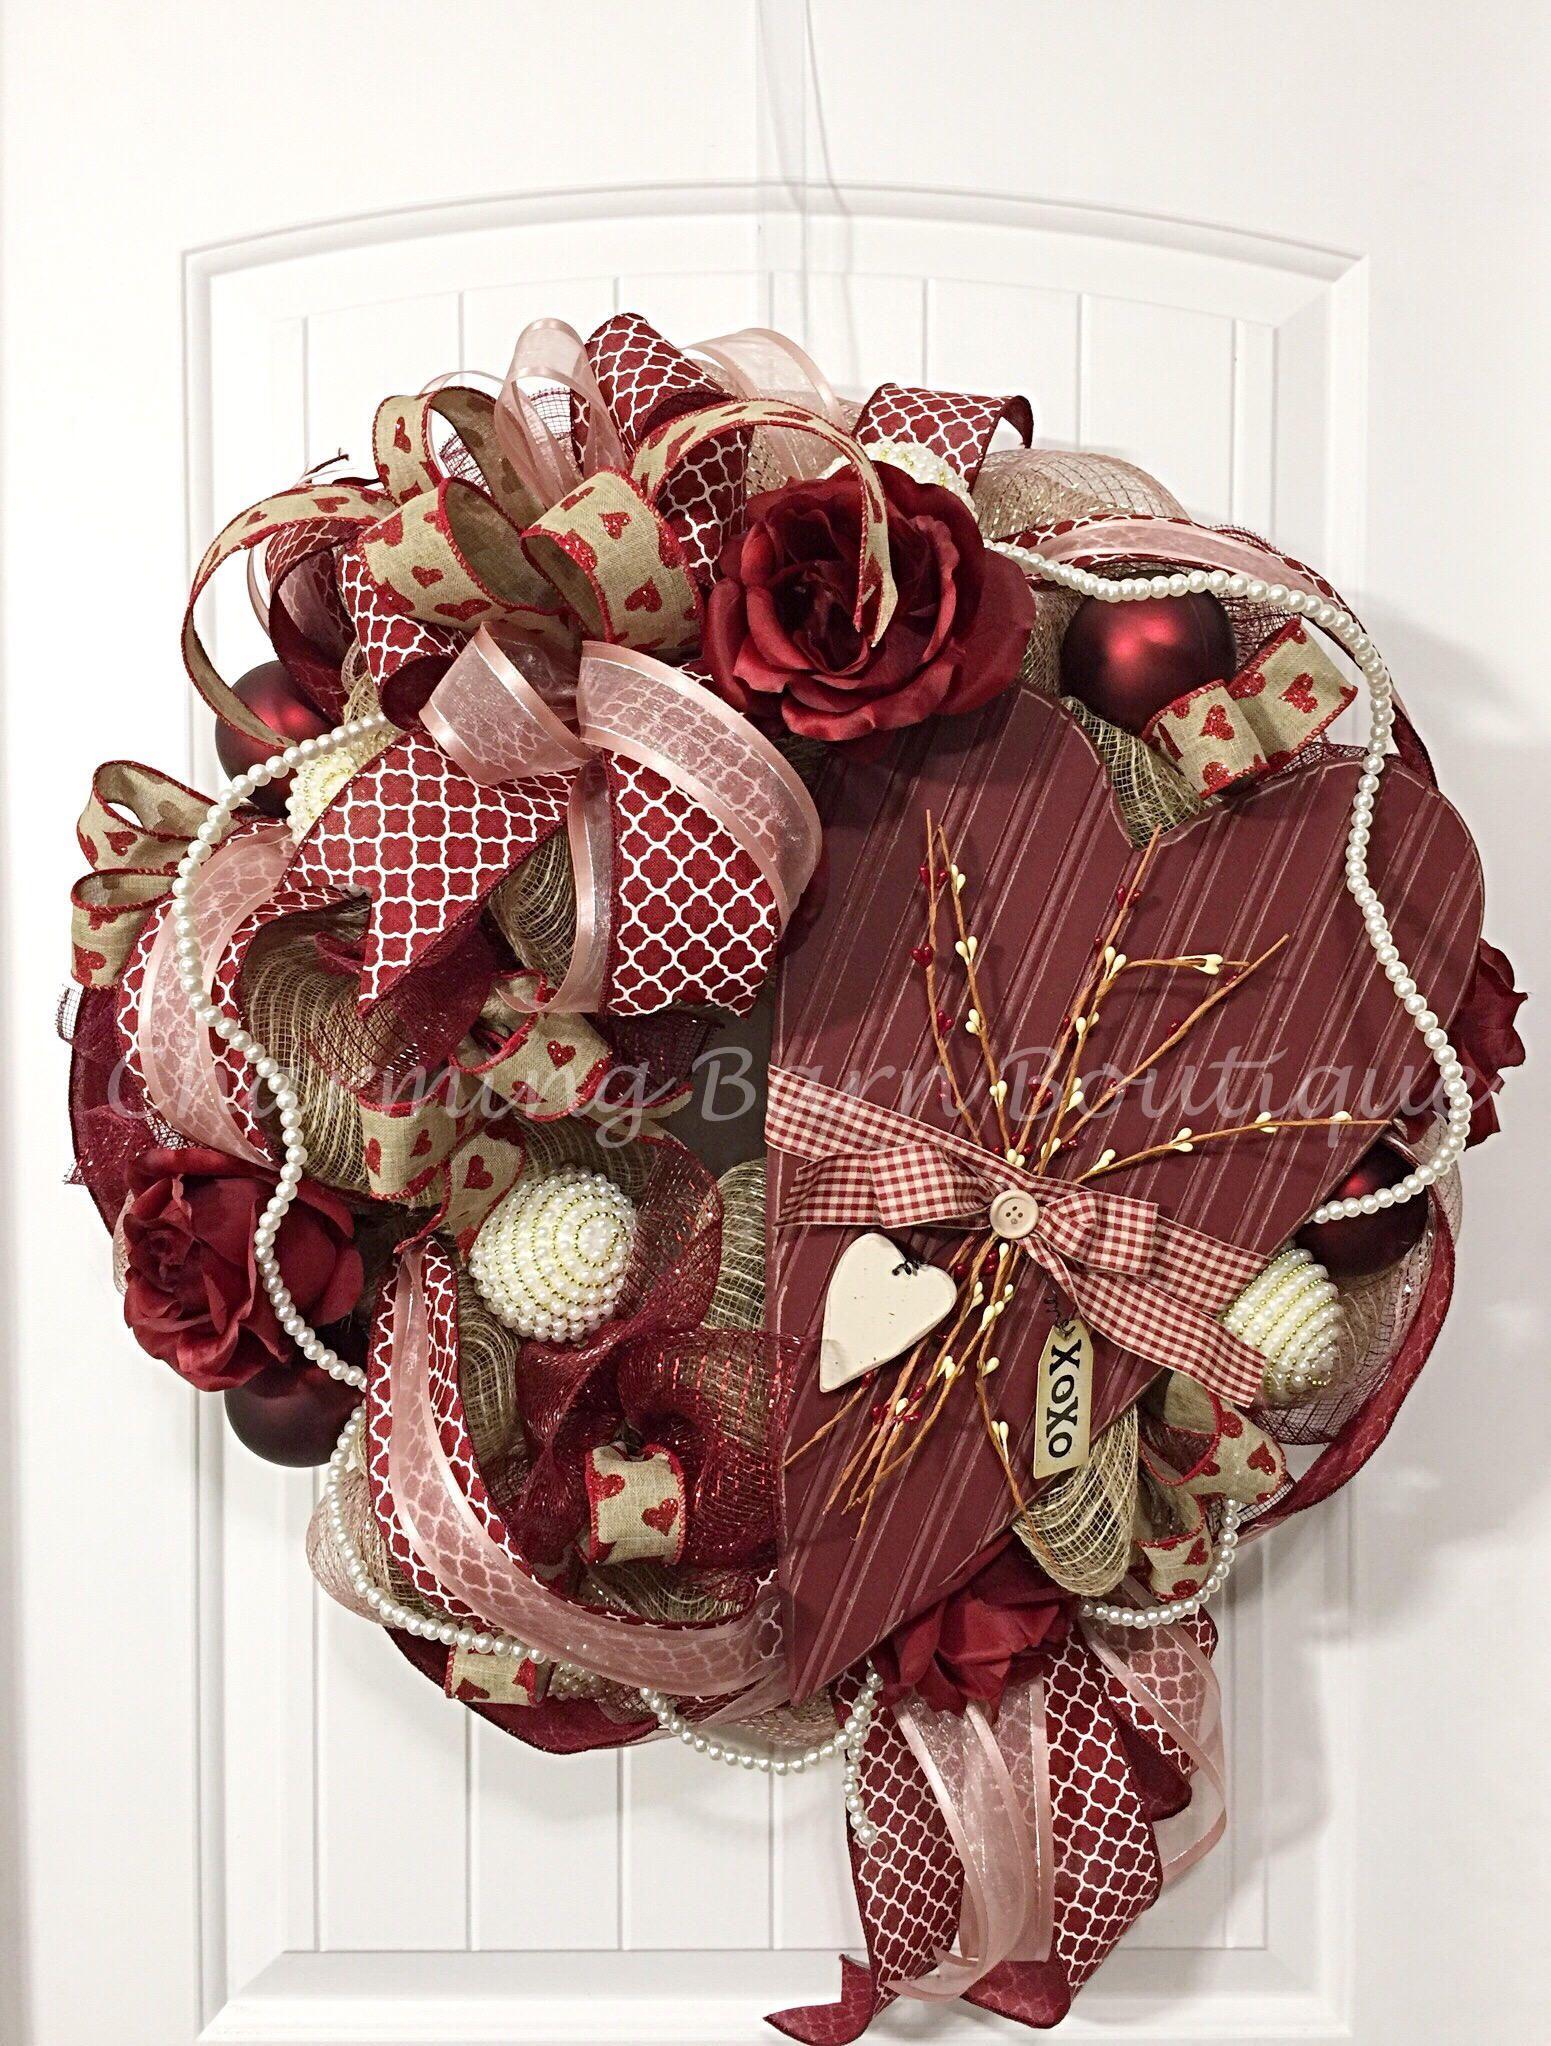 Valentines day wreath valentines day heart wreath valentines valentines day wreath valentines day heart wreath valentines wreath heart wreath front rubansaba